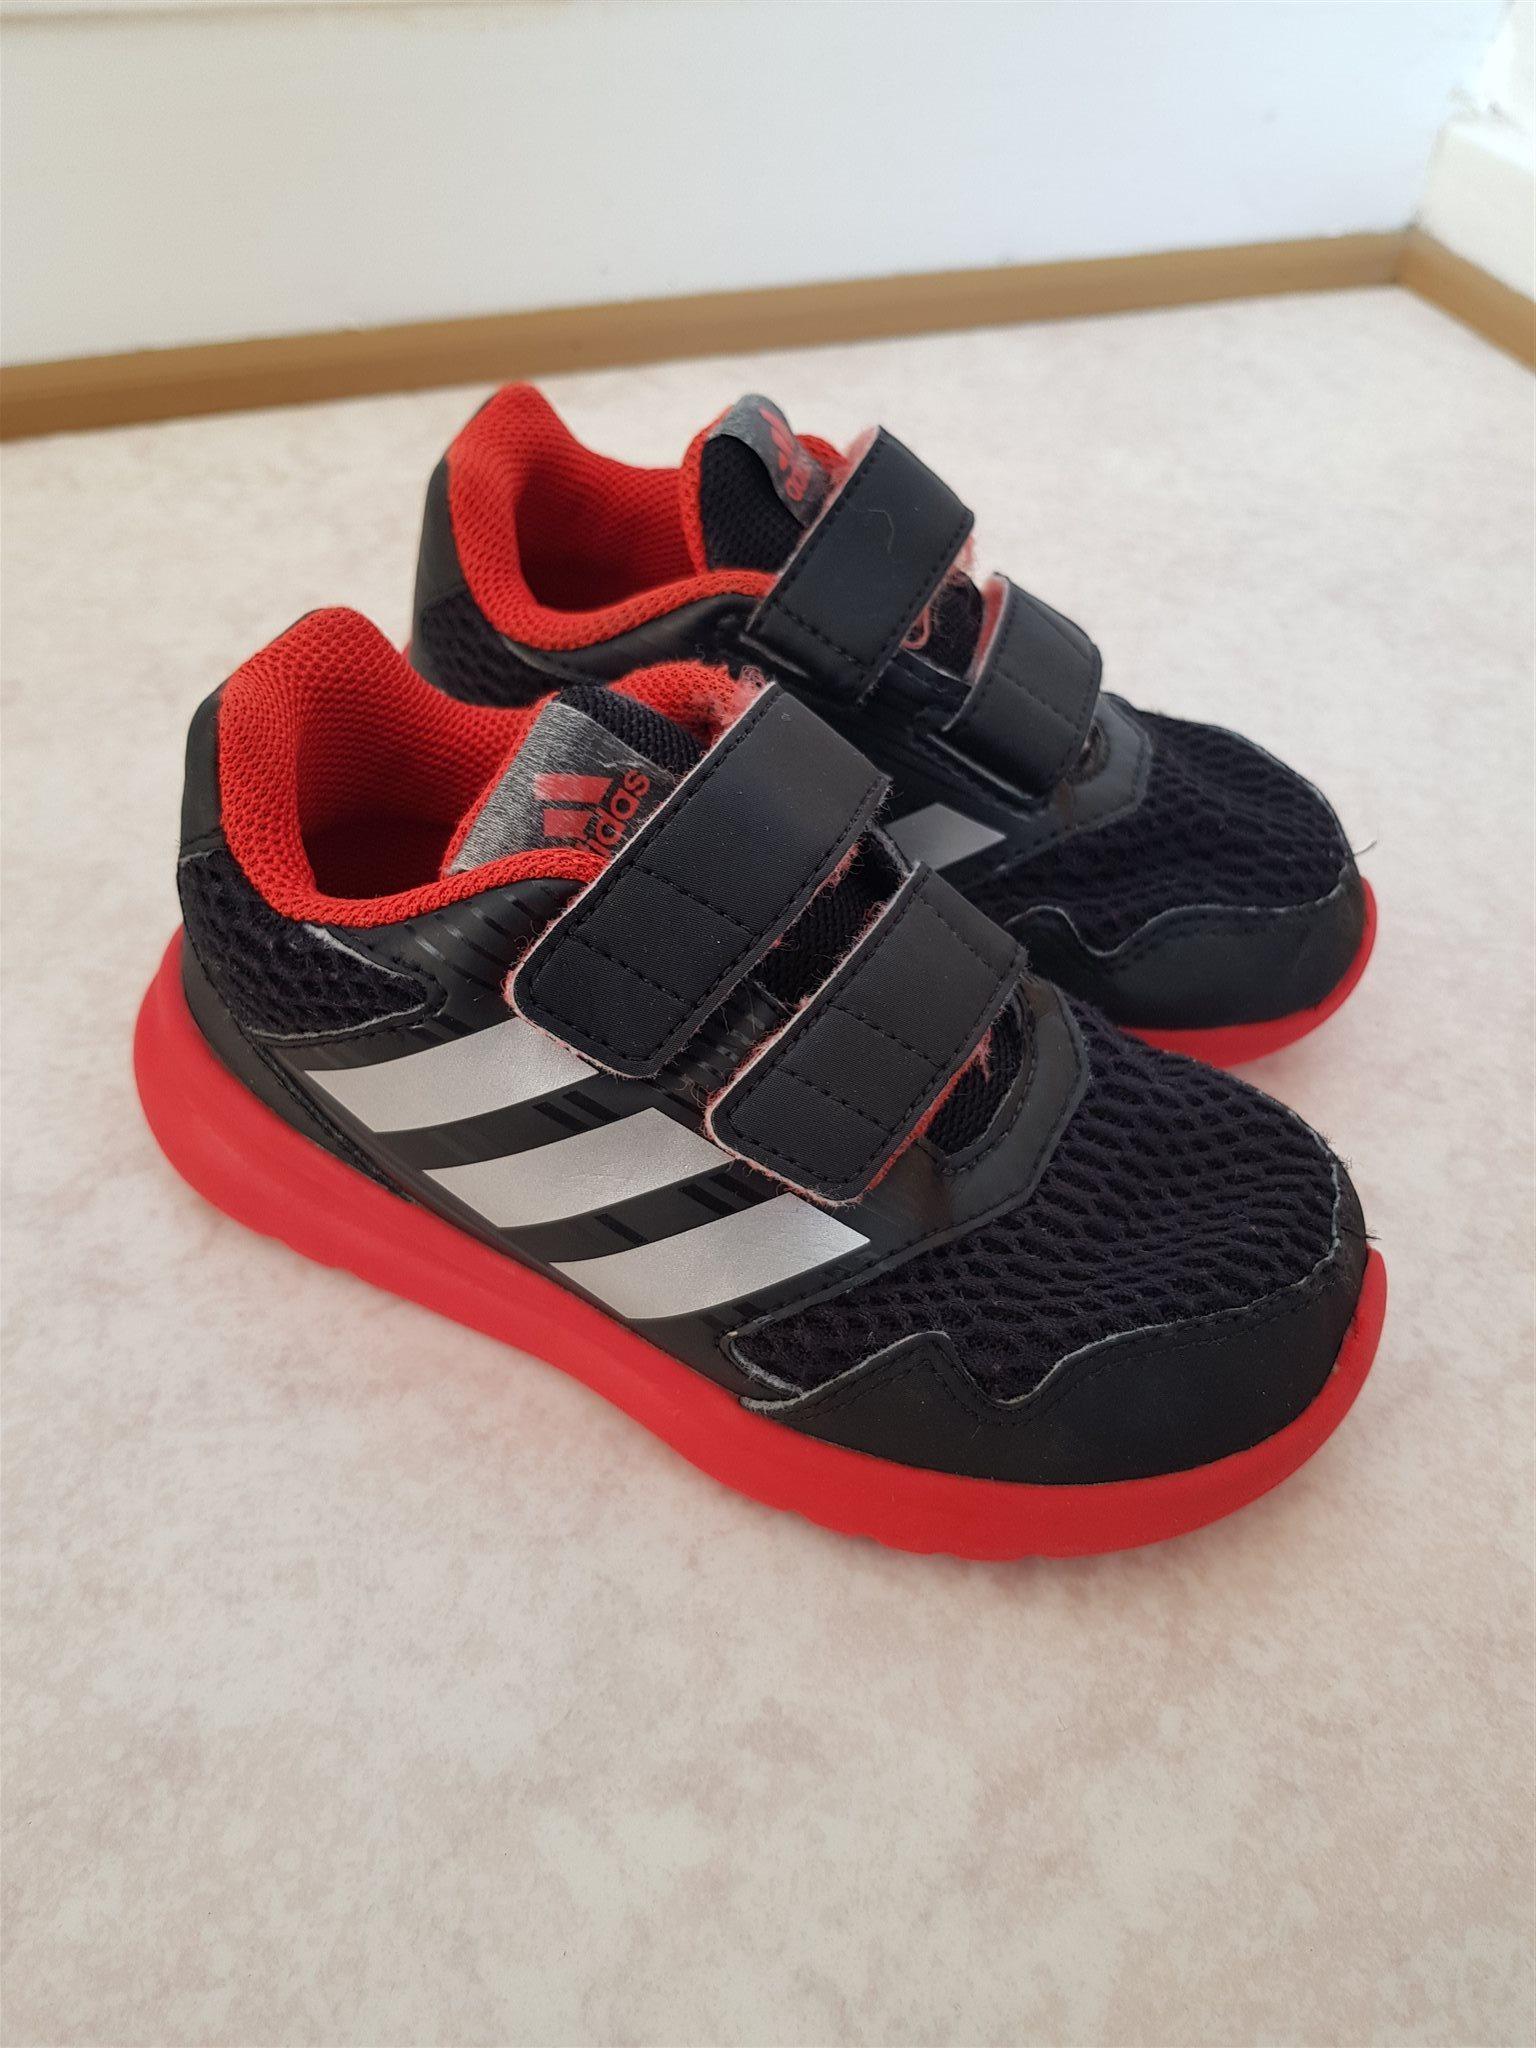 reputable site 1e08f 014e0 röda svarta sneakers strl skor amp  26 ADIDAS 320611297 HZAdwxH